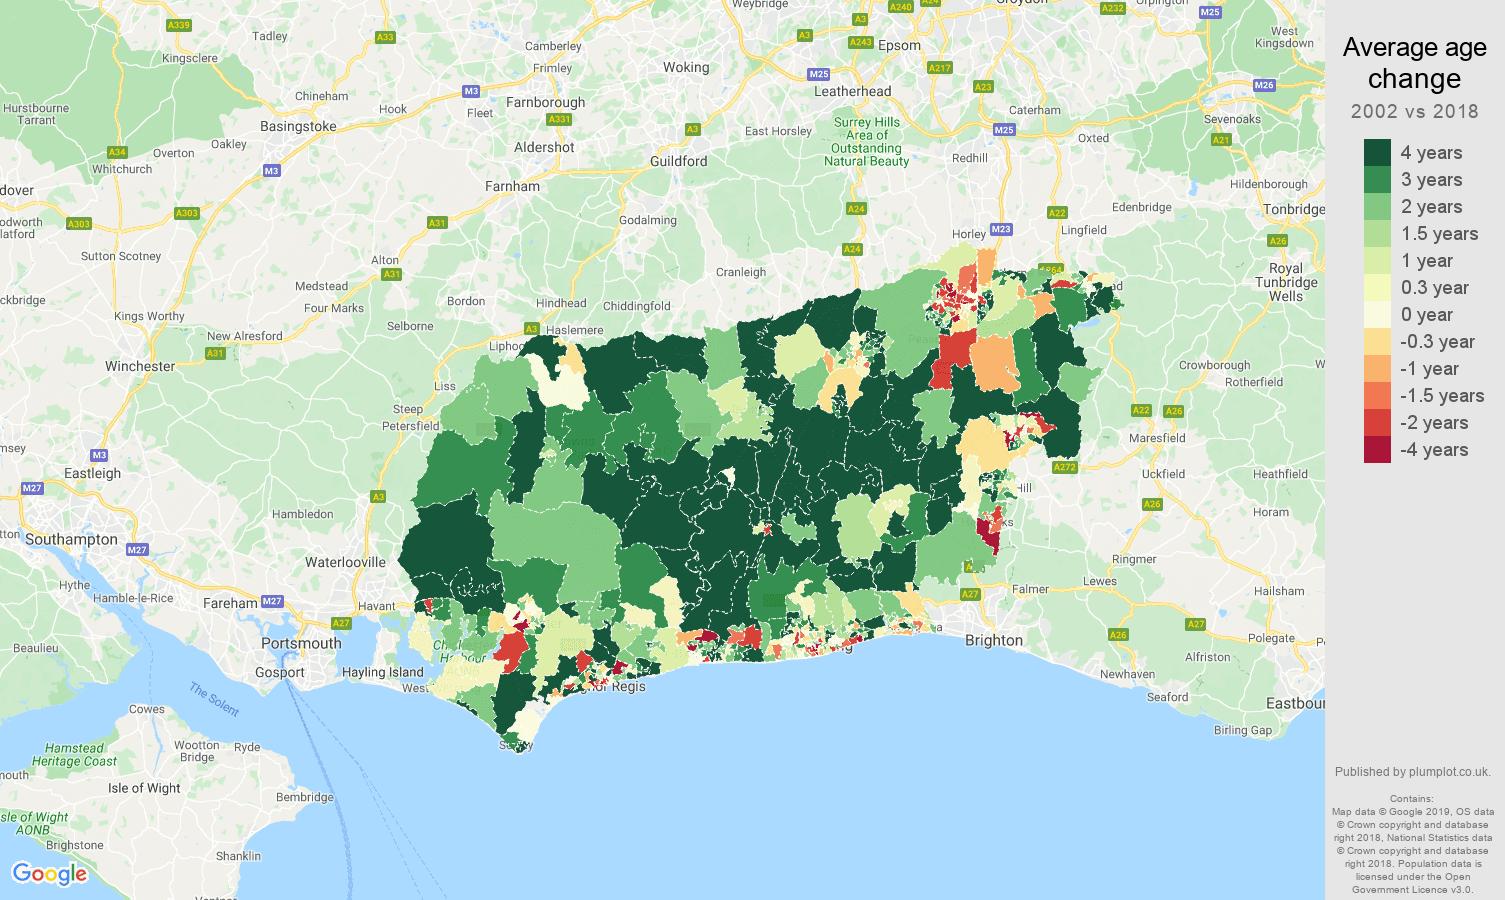 West Sussex average age change map